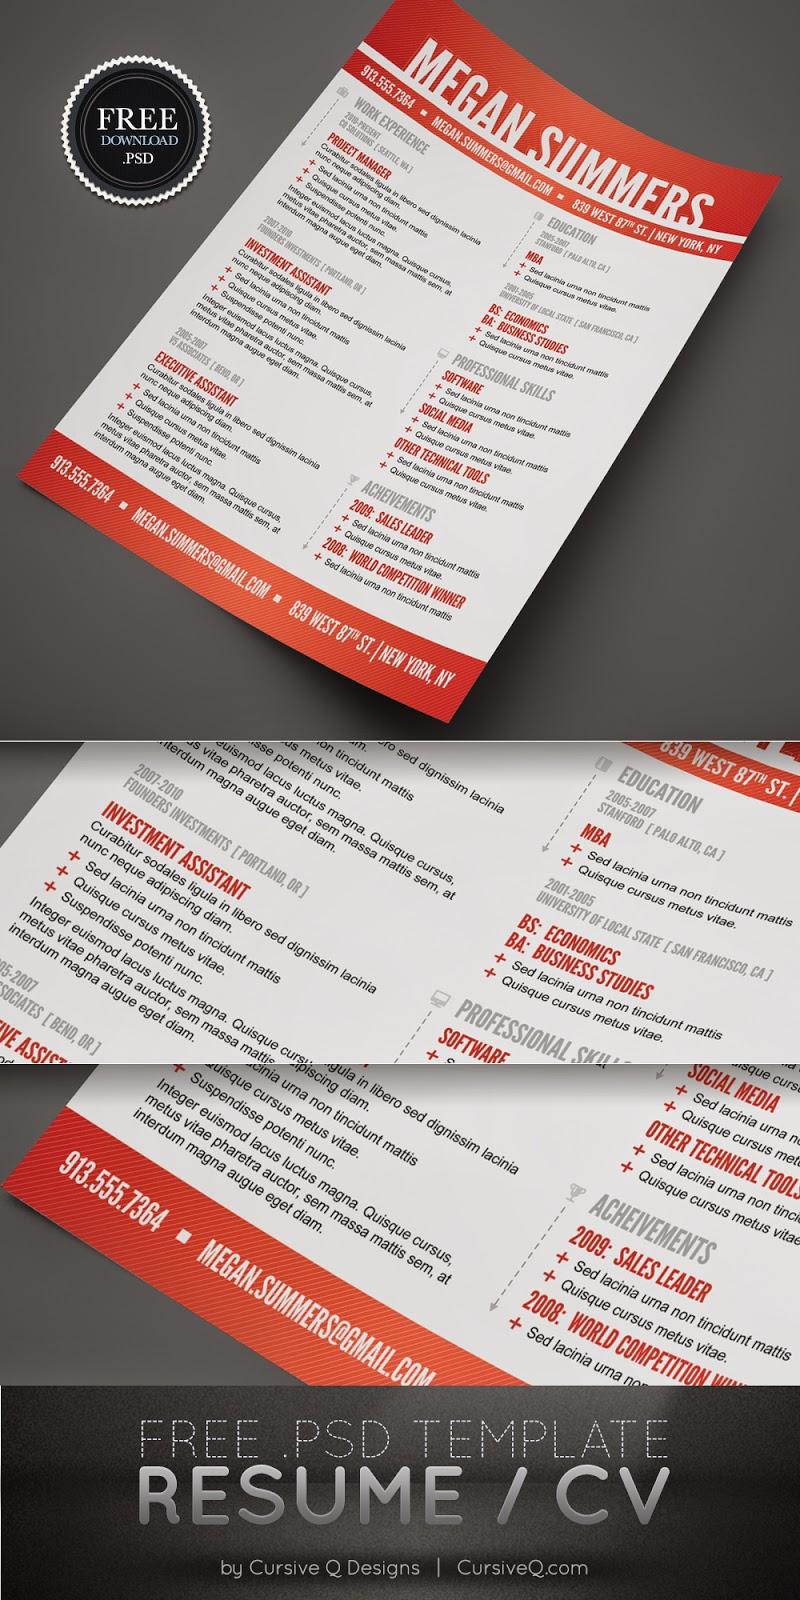 Modern Resume / CV PSD Template